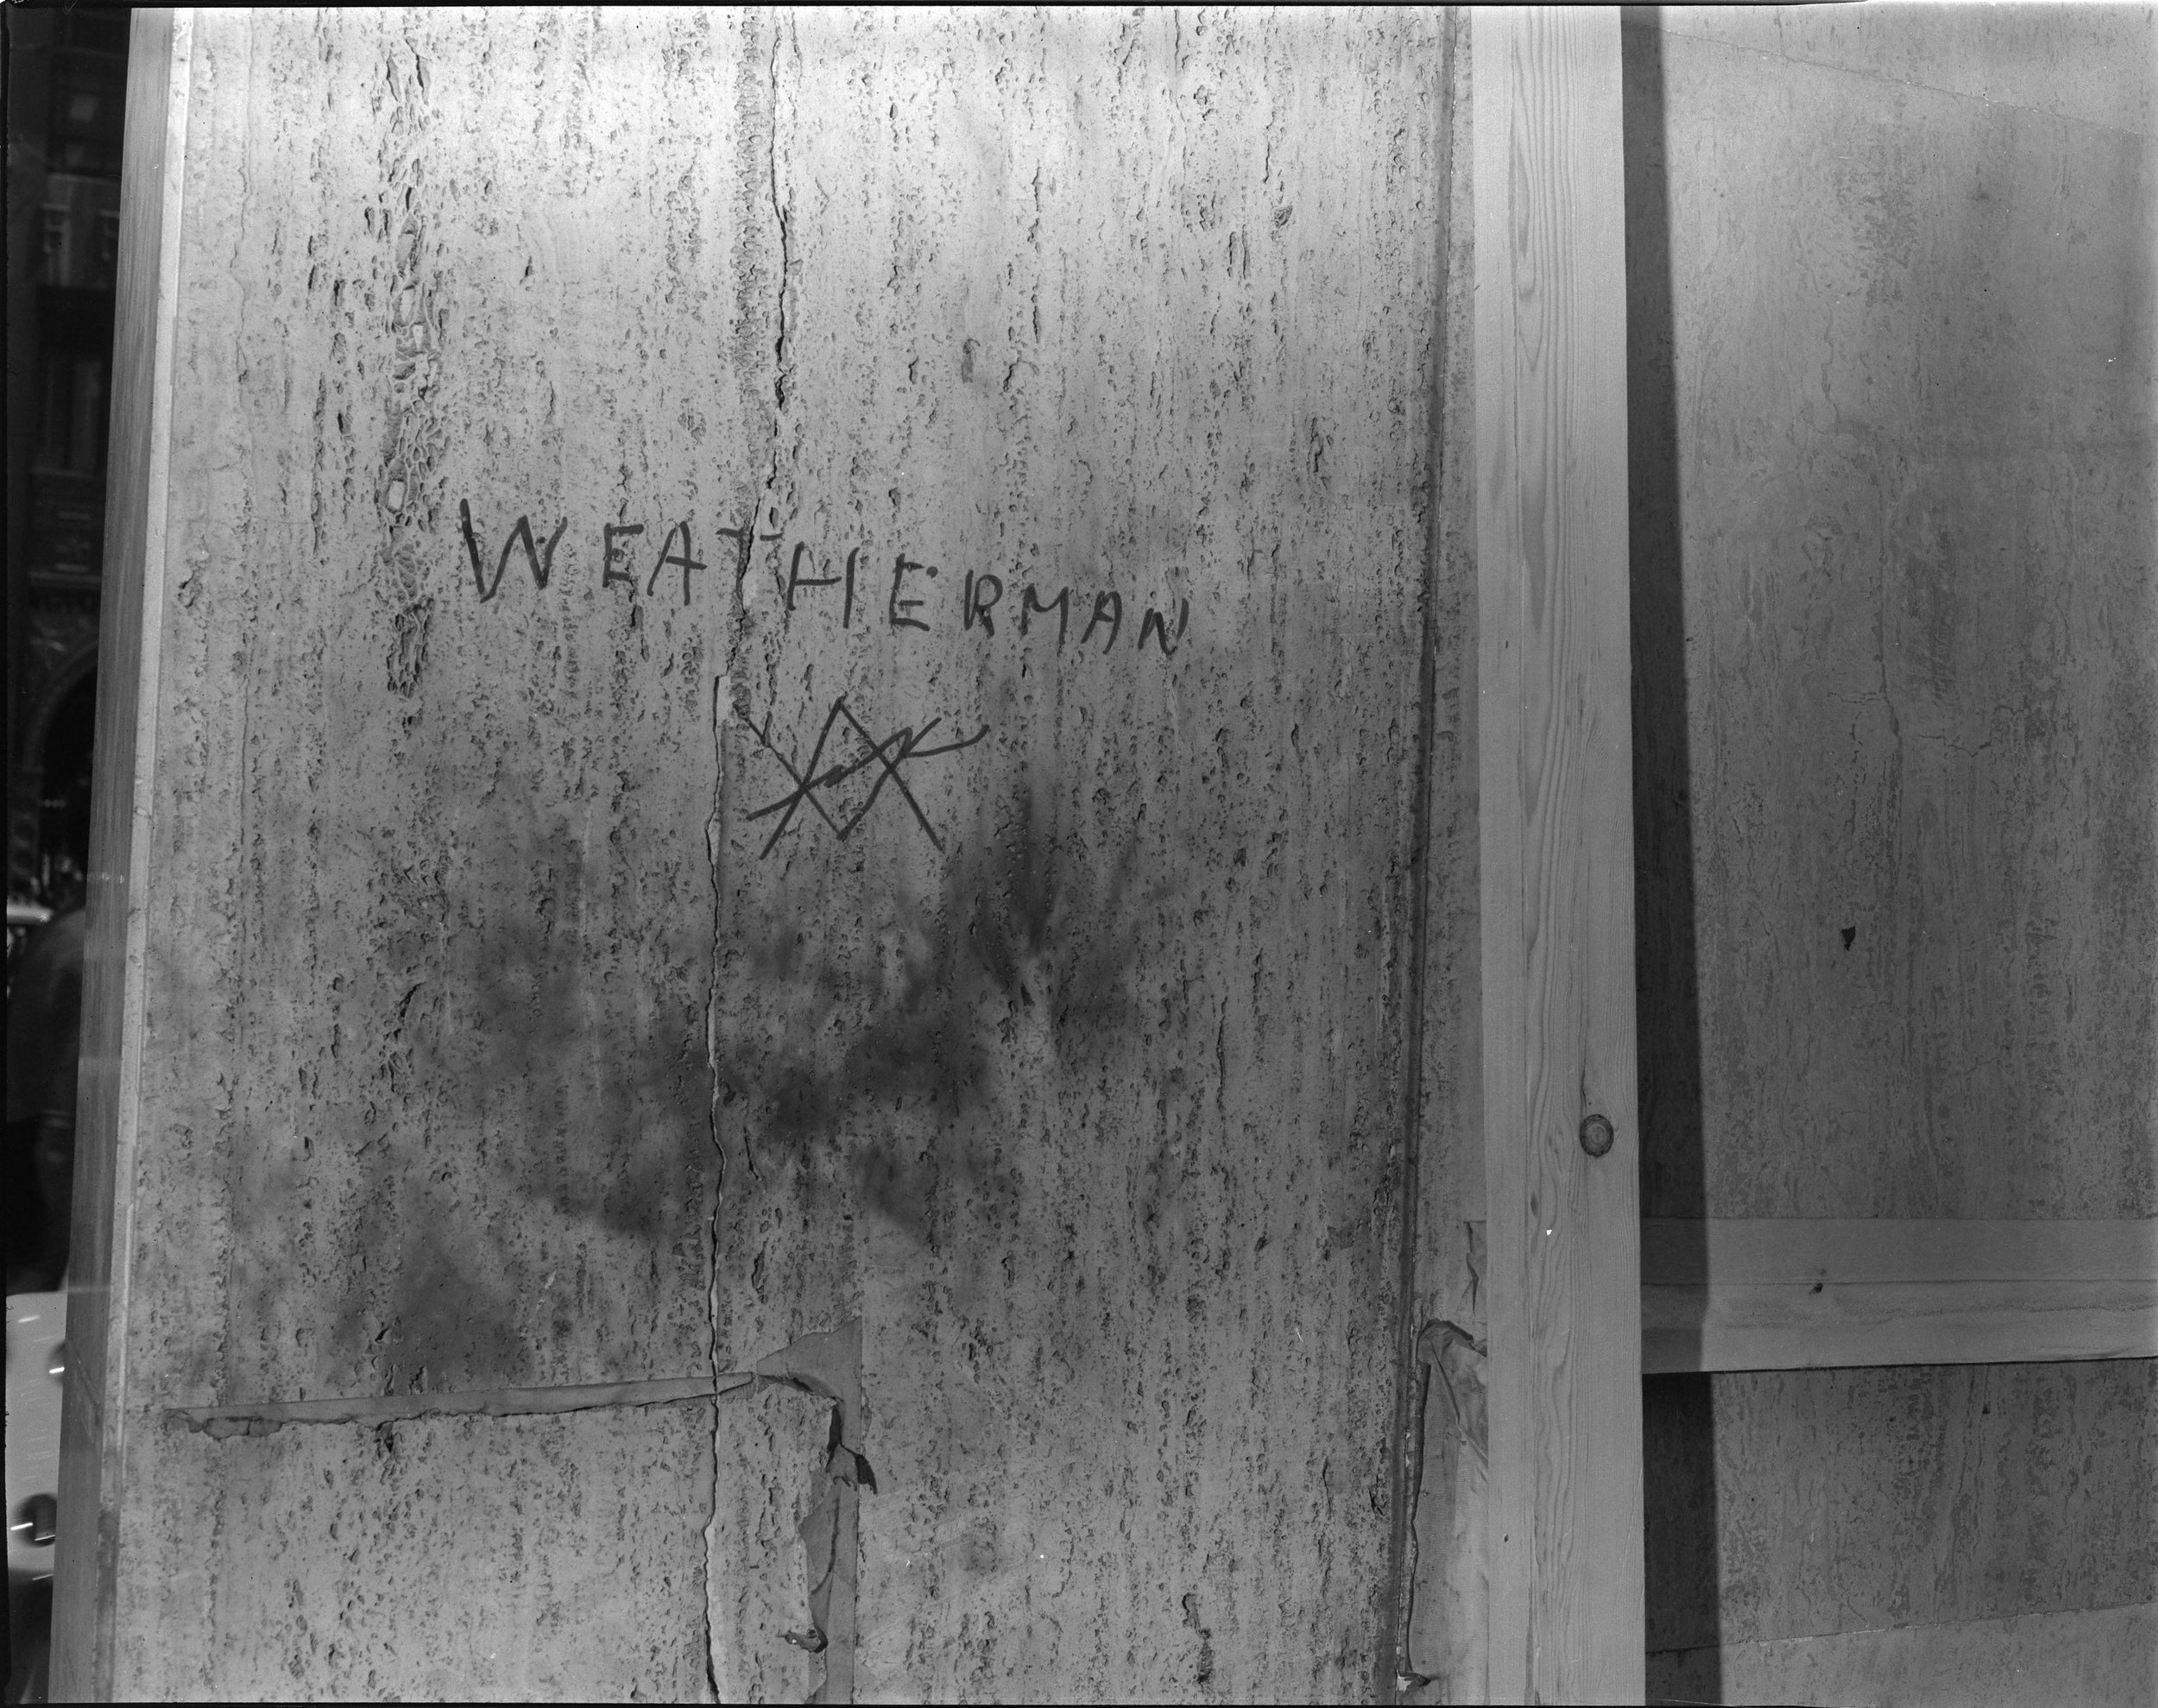 Weatherman signature, August 1, 1970